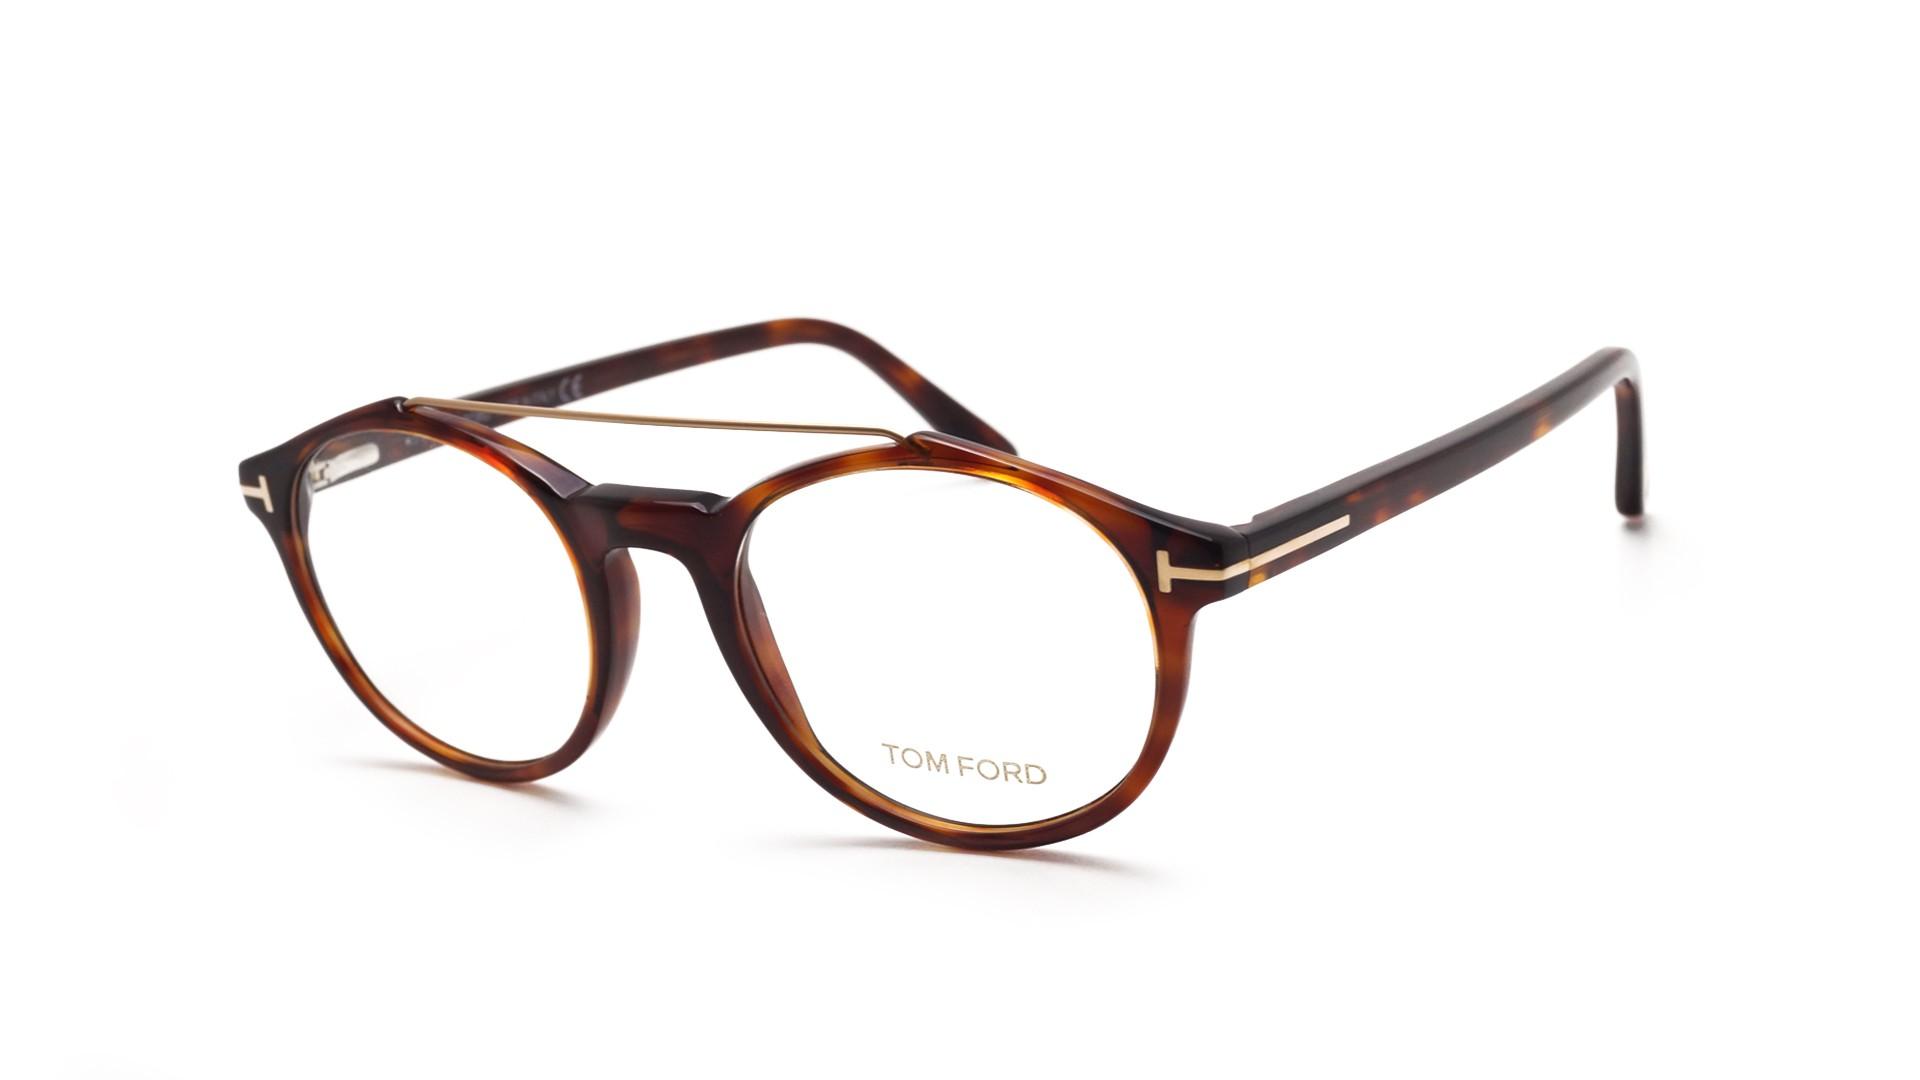 58030bed9d Tom Ford FT5455 052 50-20 Écaille | Prix 120,33 € | Visiofactory